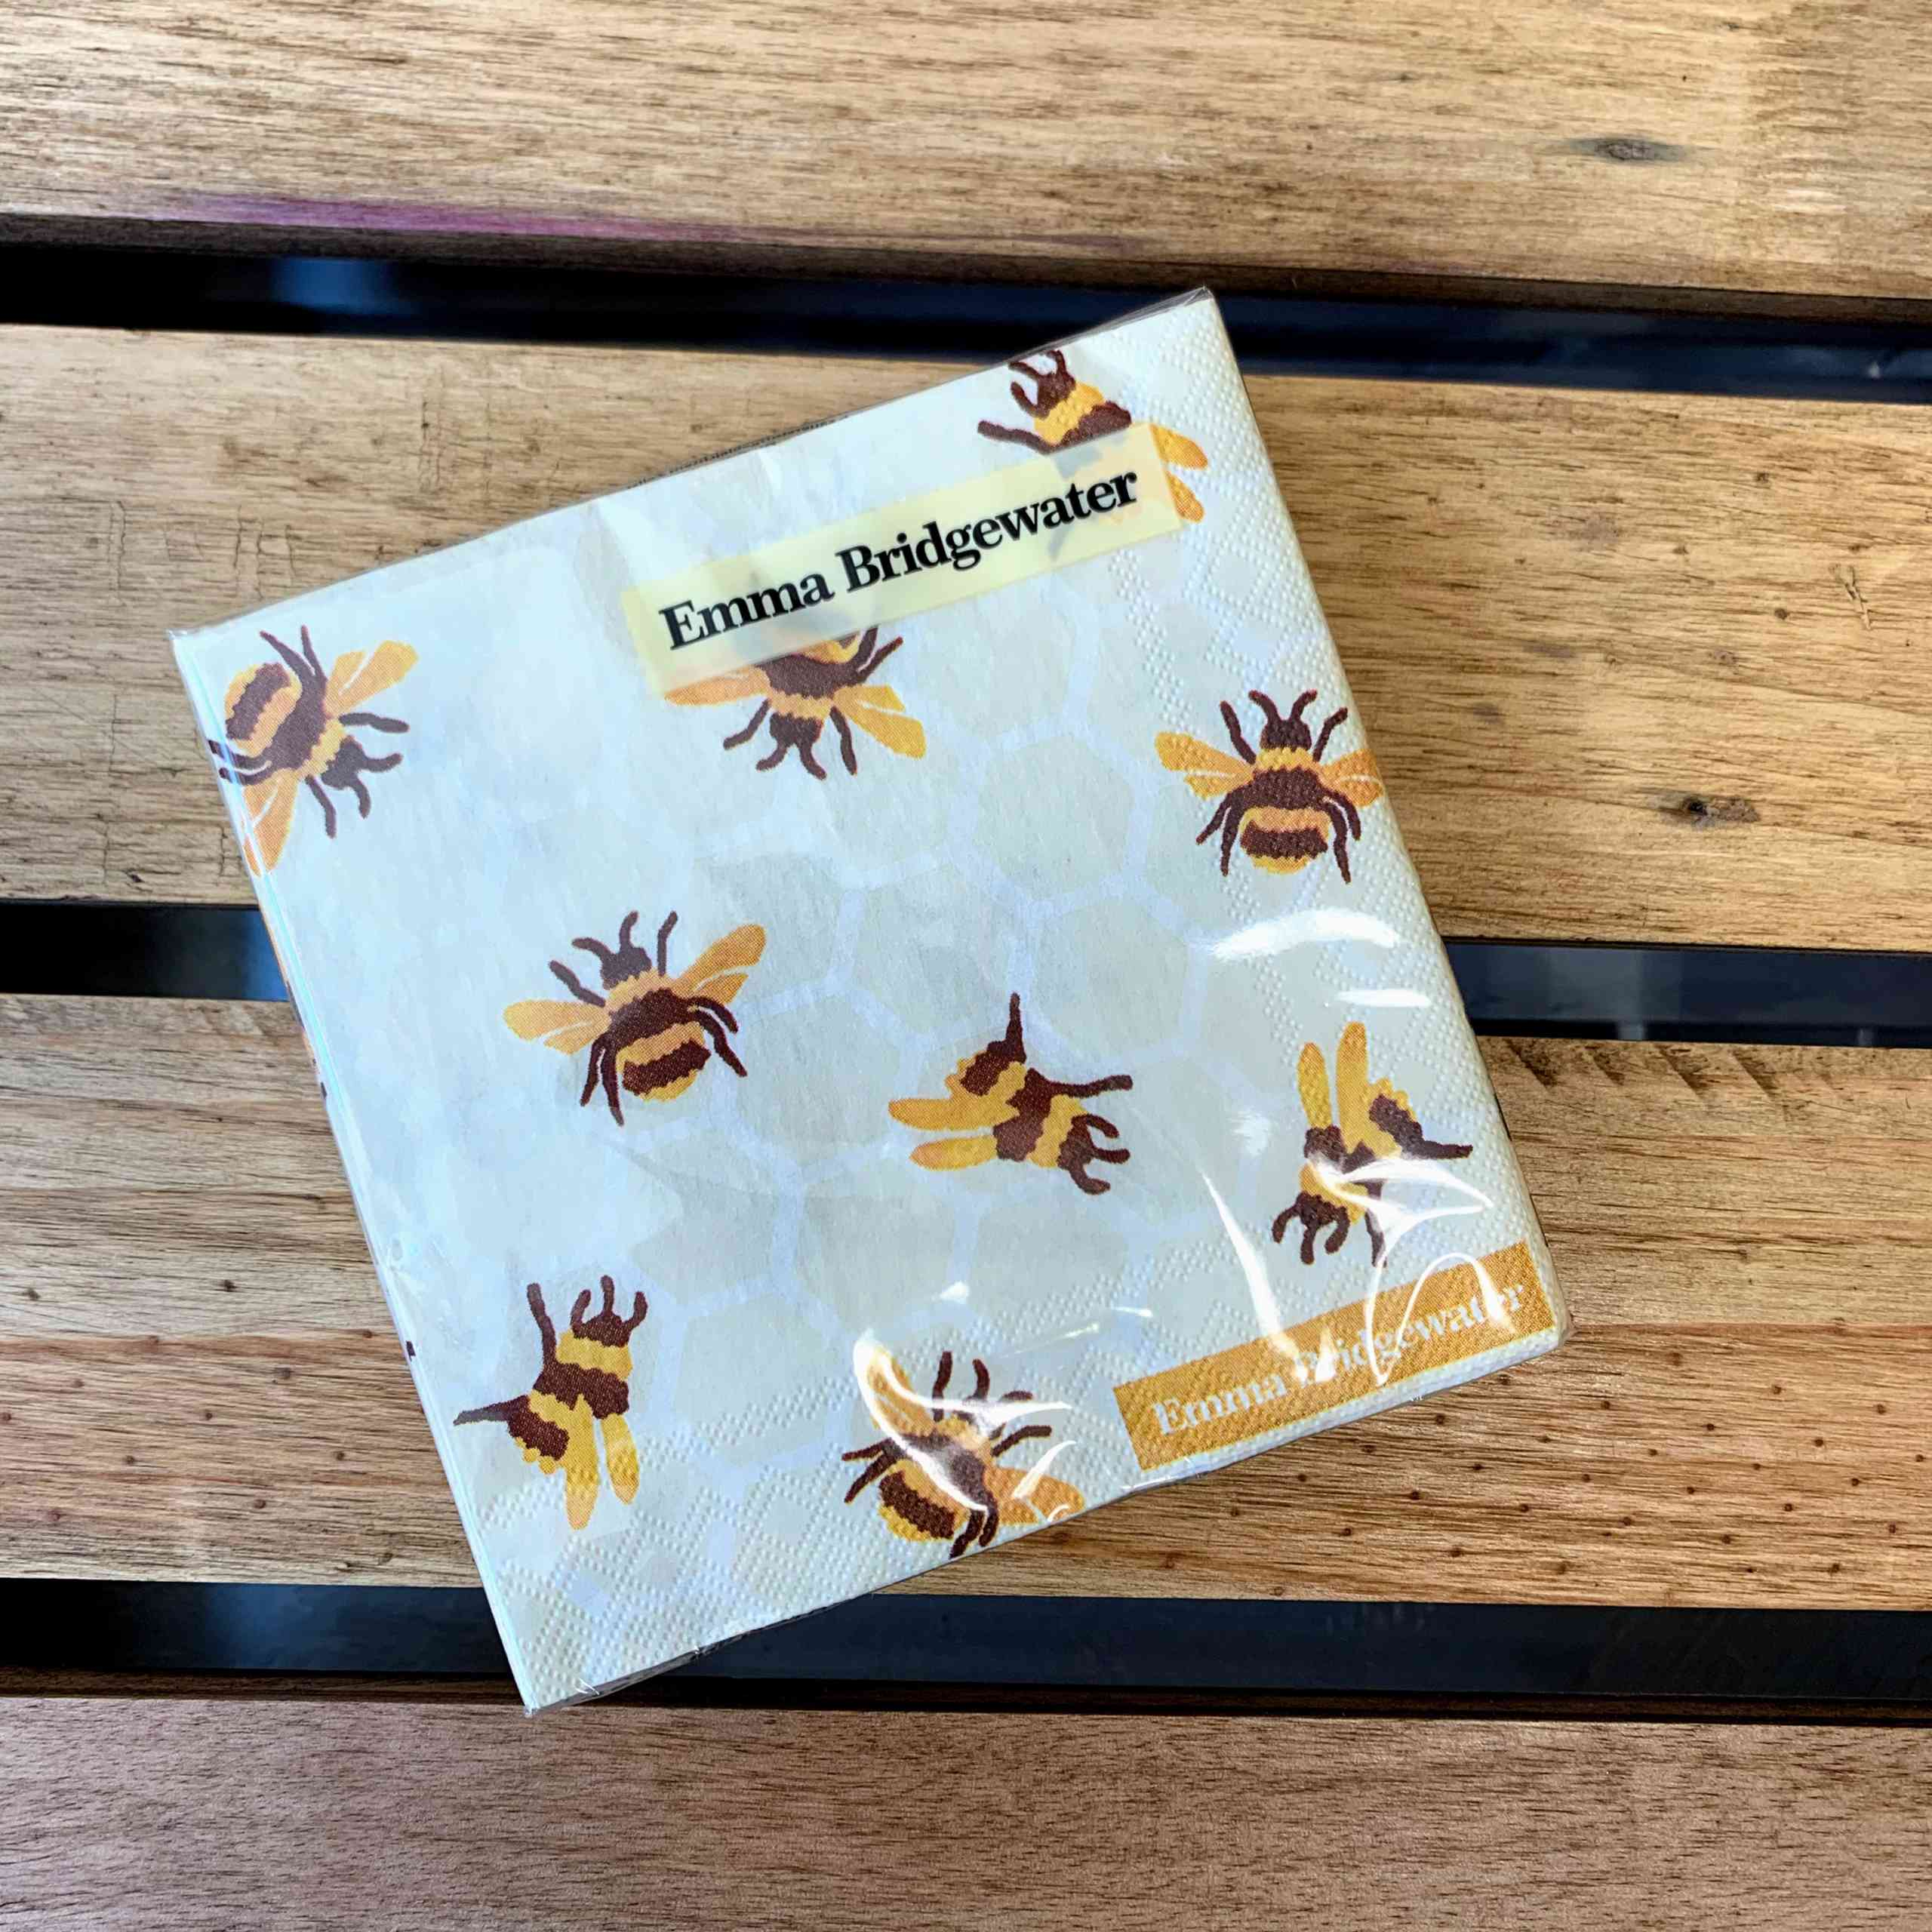 Emma Bridgewater Napkins - Bees